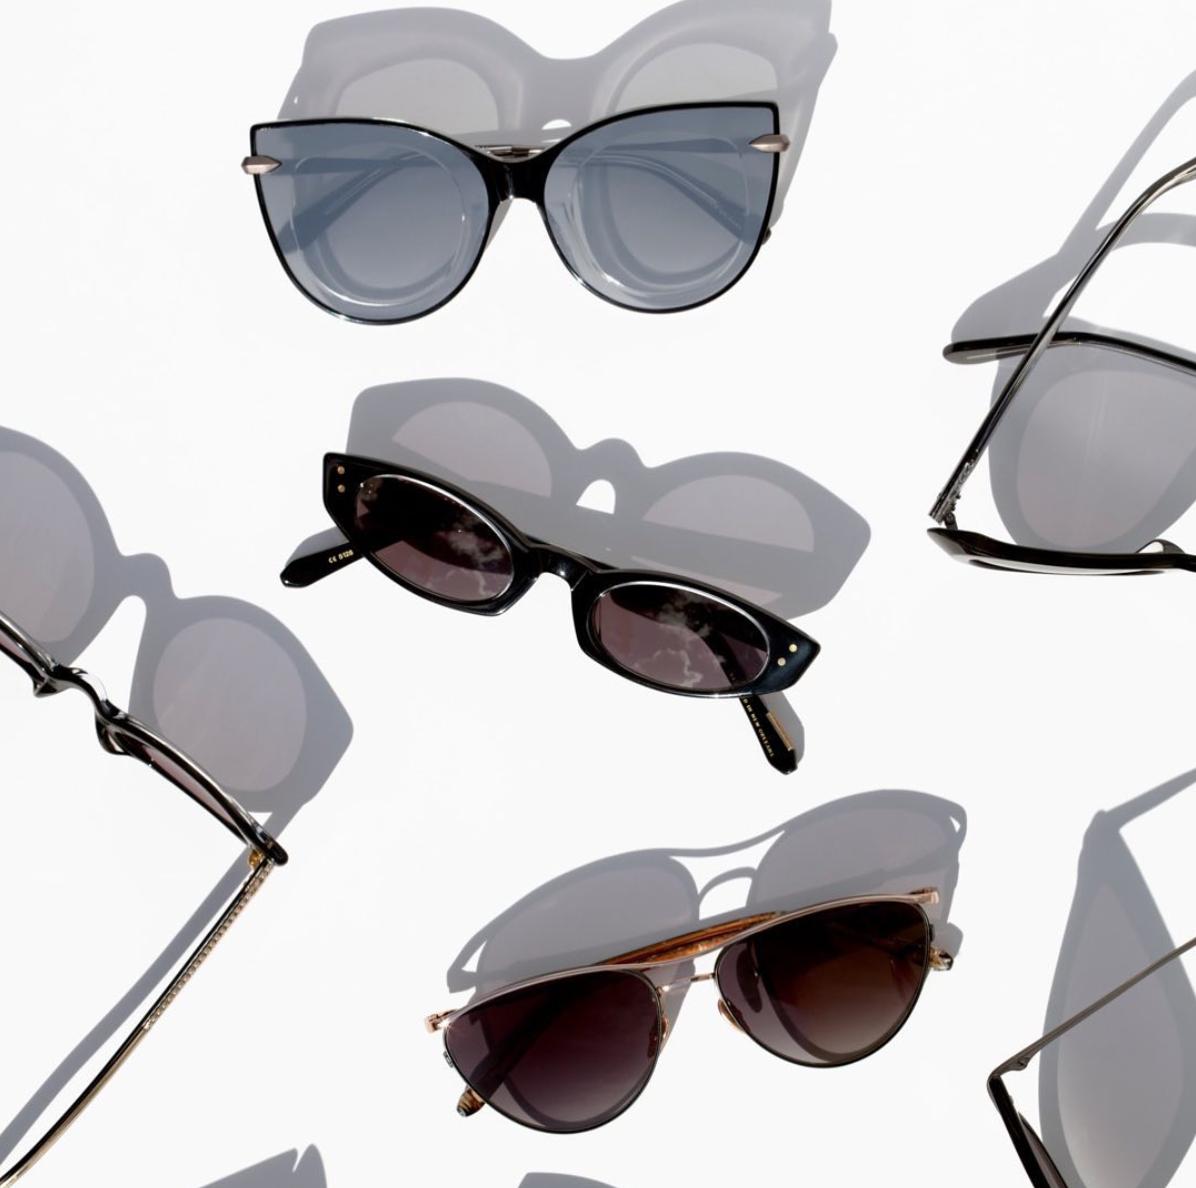 prescription sunglasses winston salem nc.png